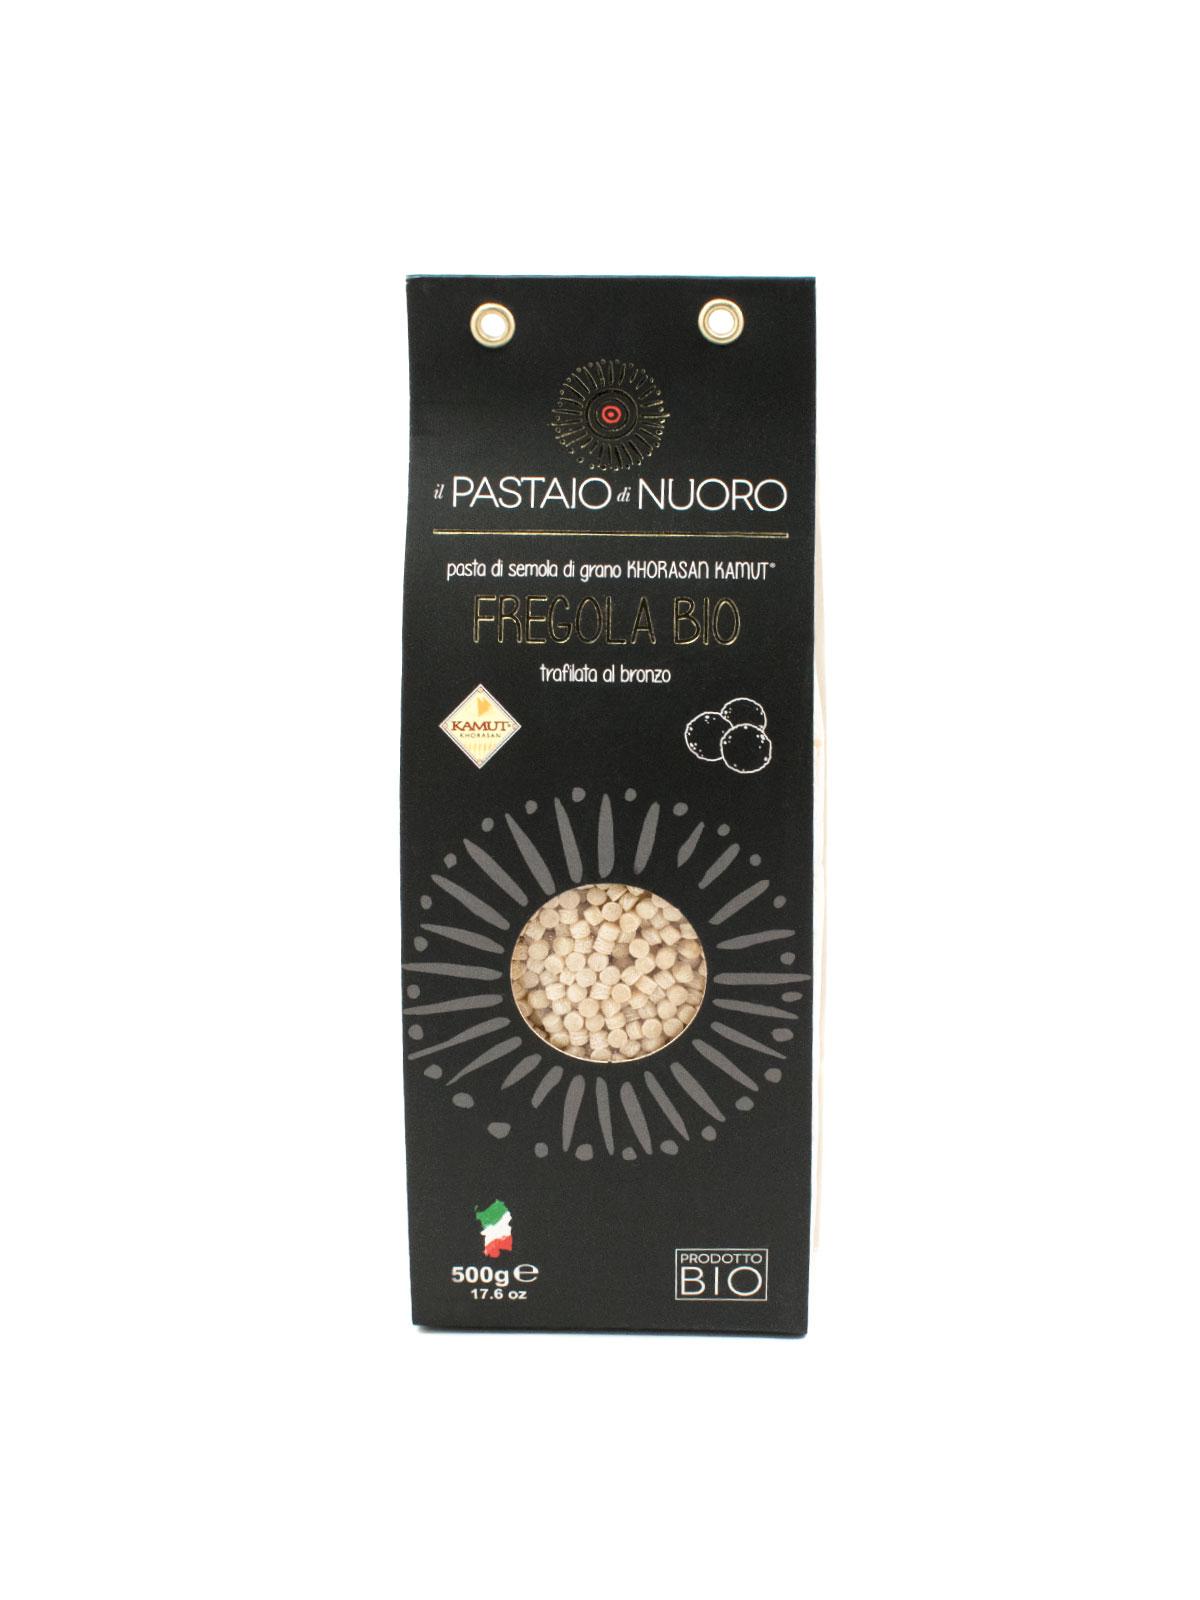 Organic Khorasan KamutFregola - Pastas, Rice, and Grains - Buon'Italia